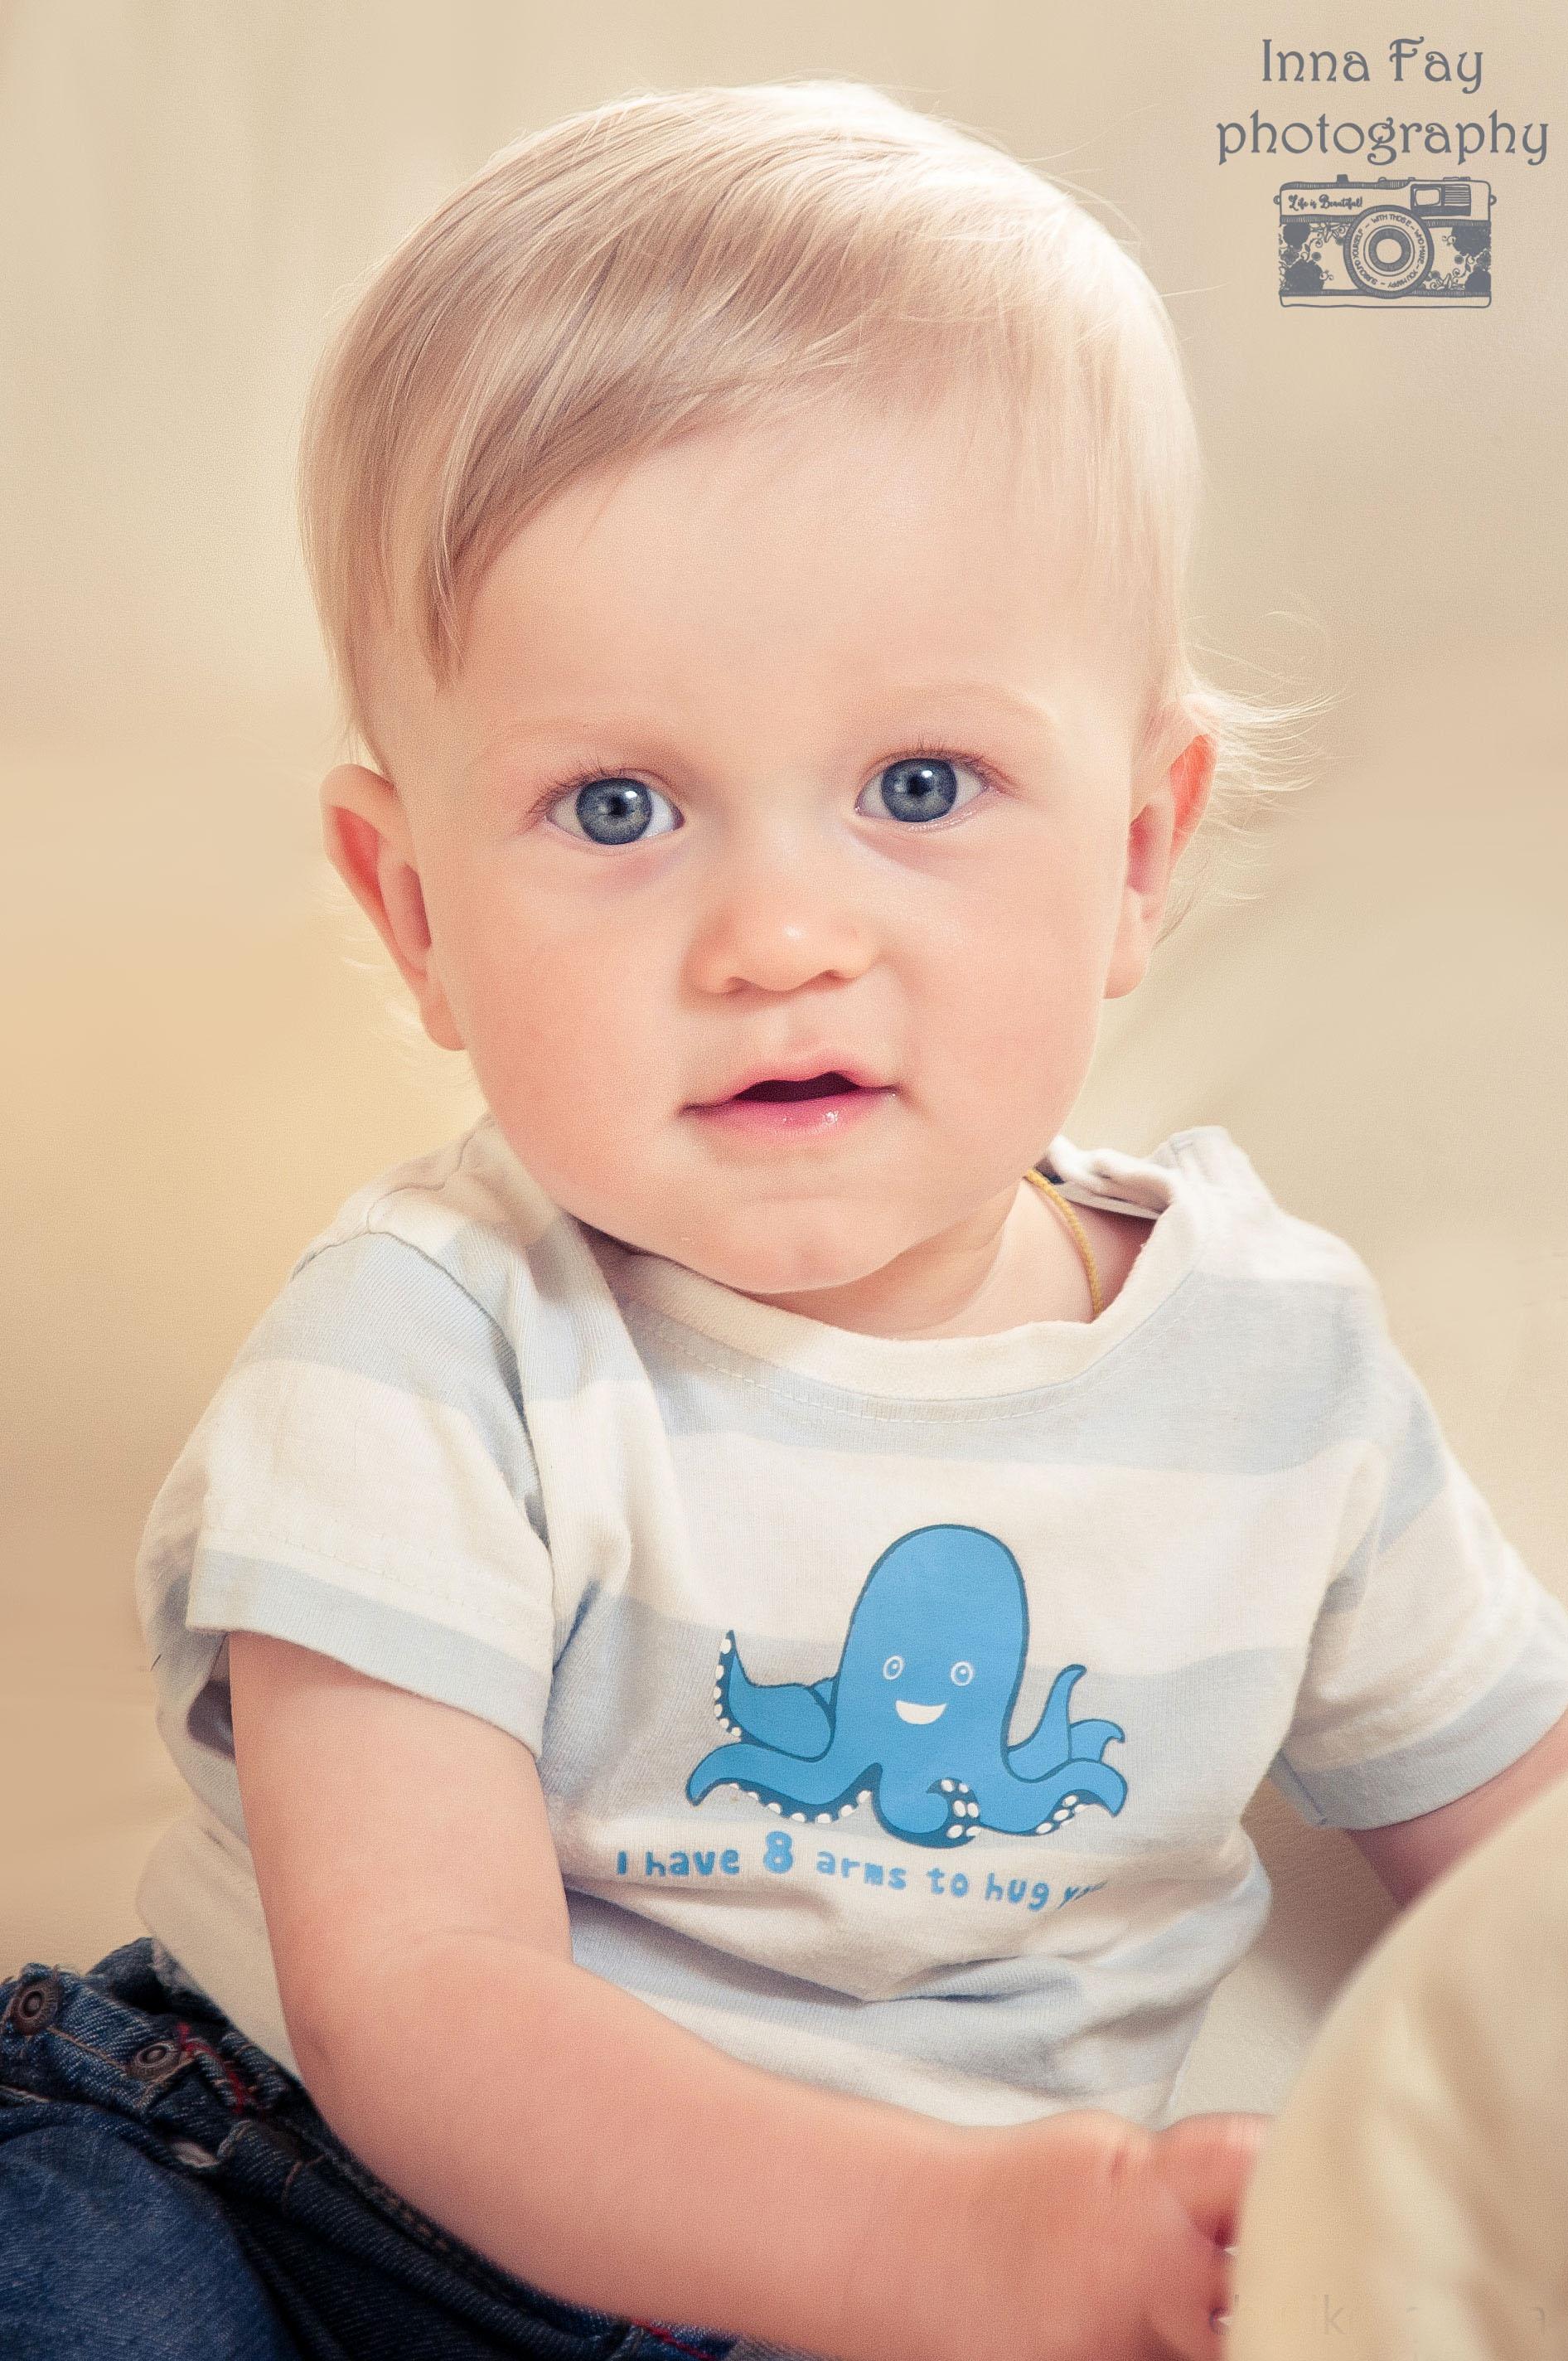 nyc baby photographer